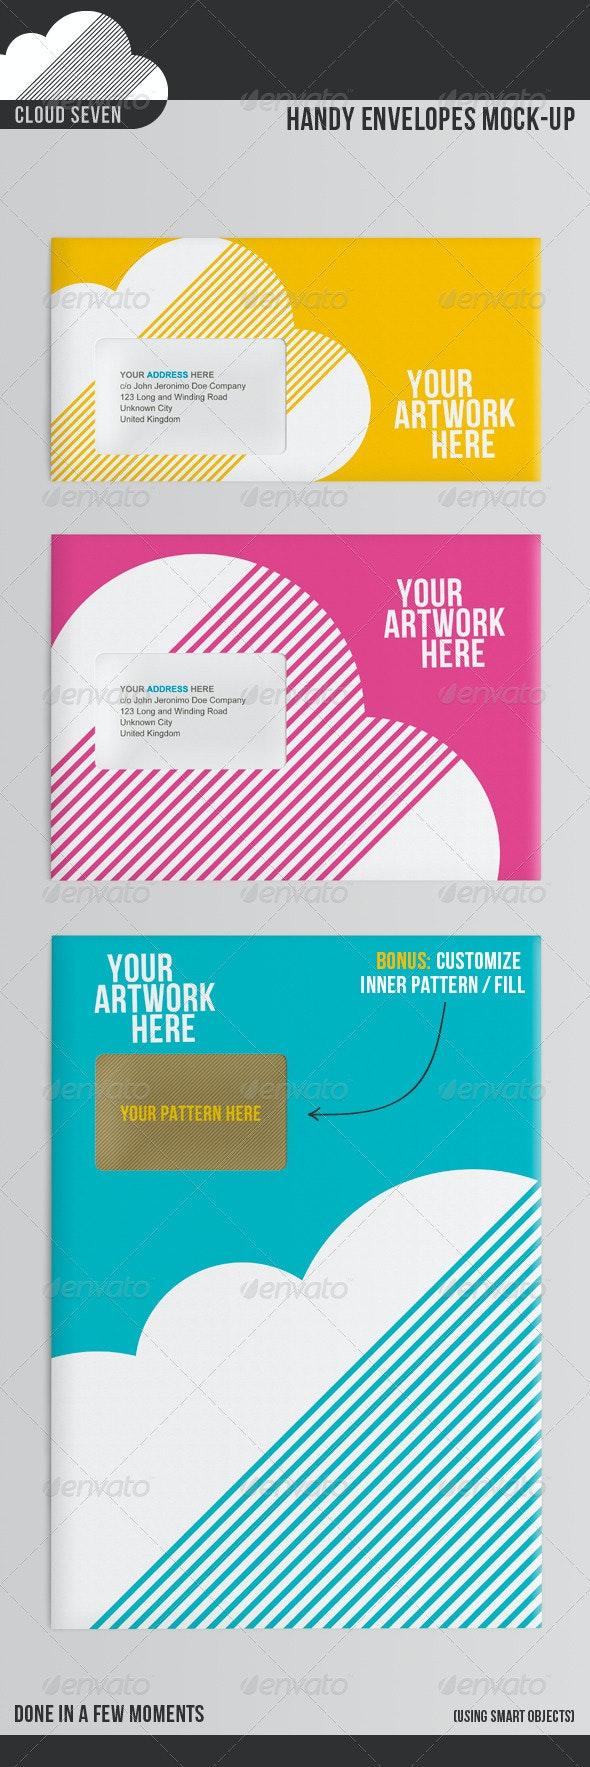 Handy Envelopes Mock Up - Stationery Print